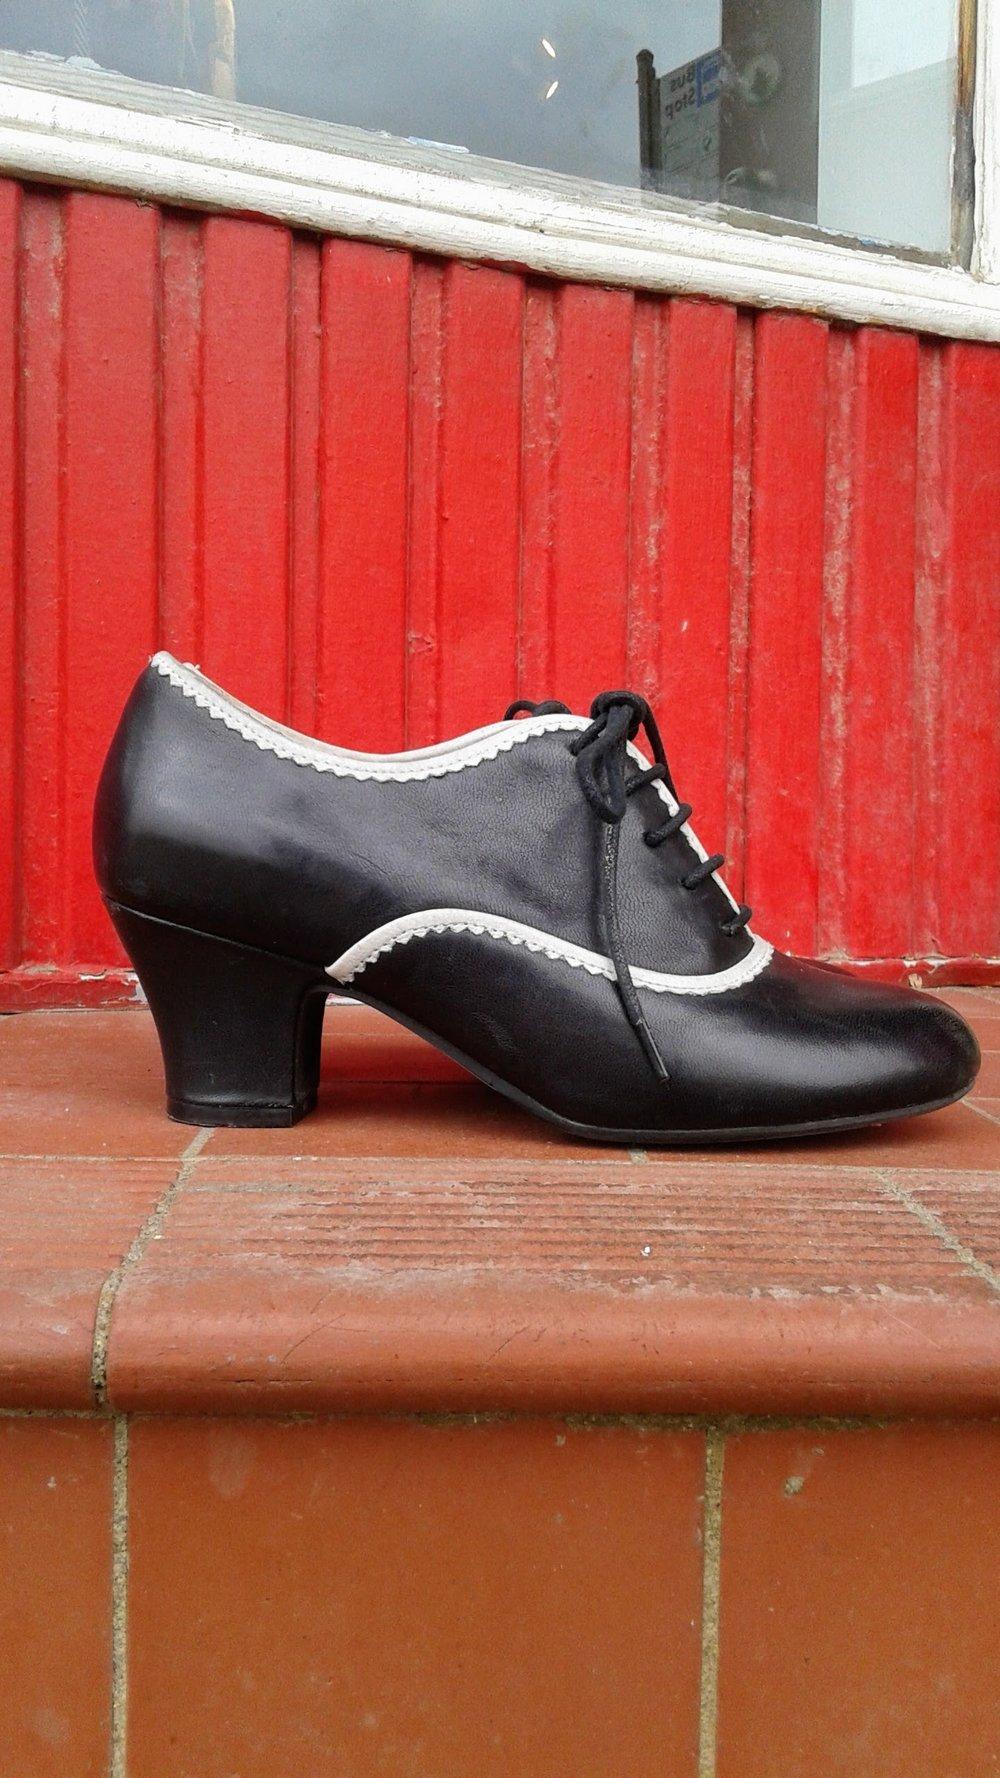 Miz Mooz shoes; S6, $42